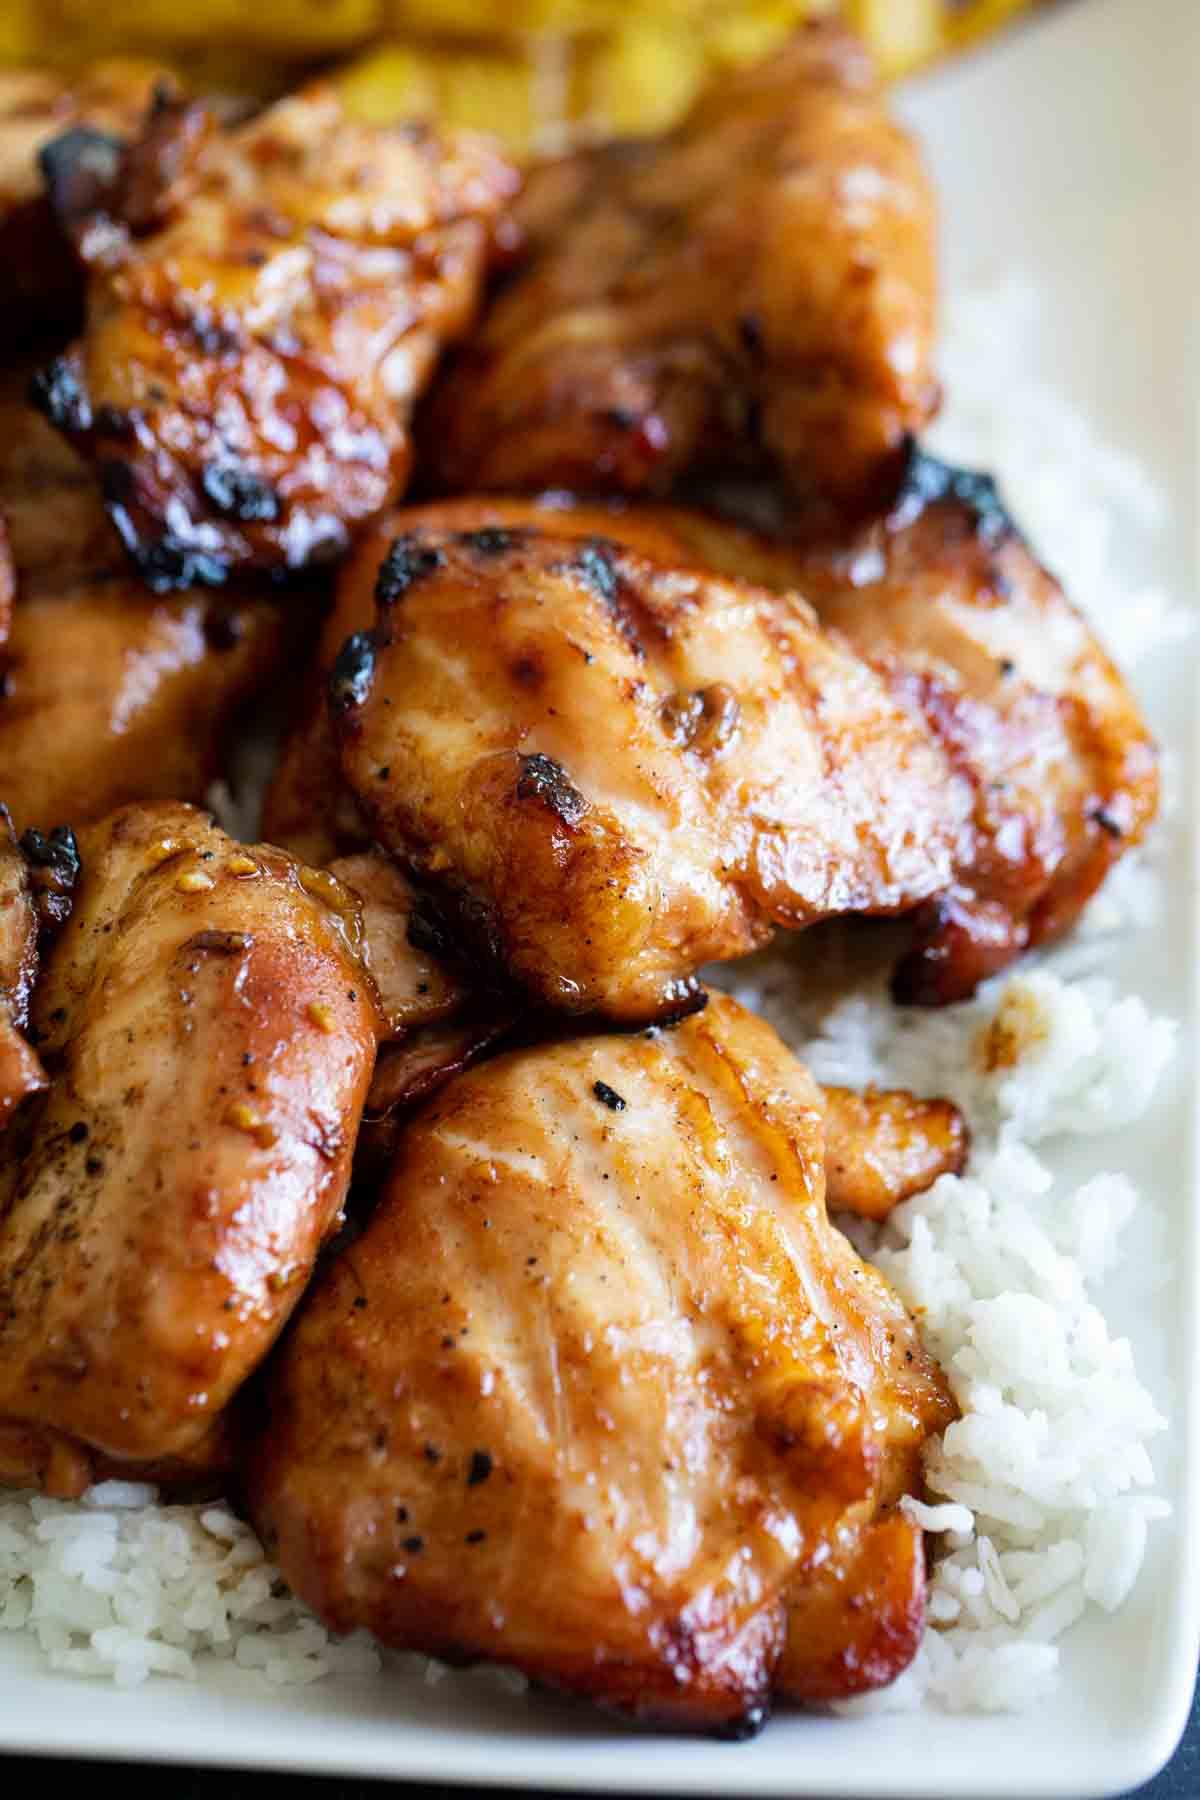 Huli Huli Chicken served on a bed of rice